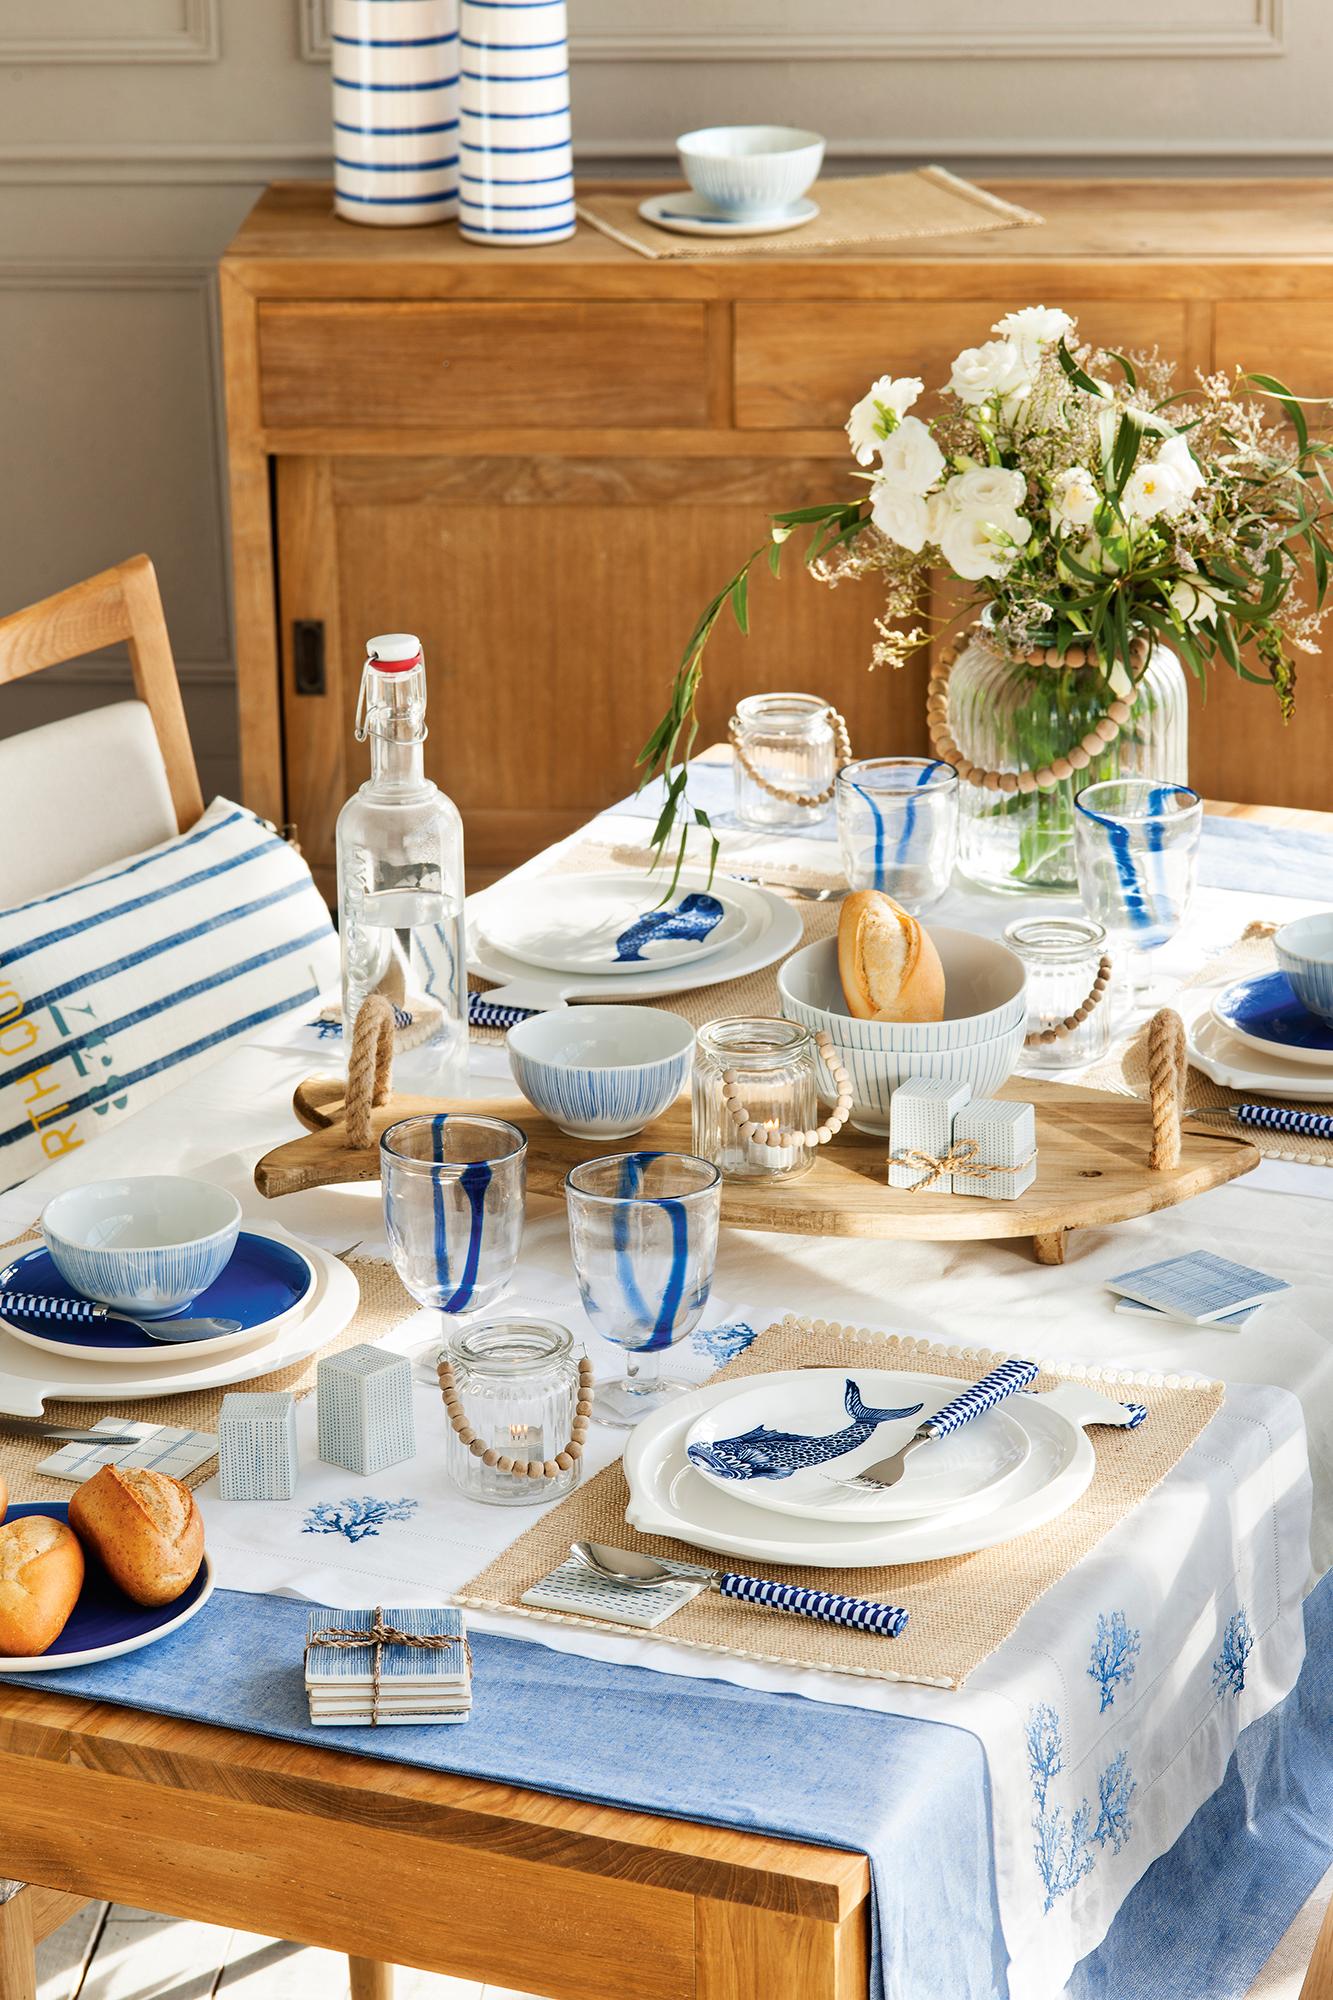 8 ideas para decorar tu mesa este verano